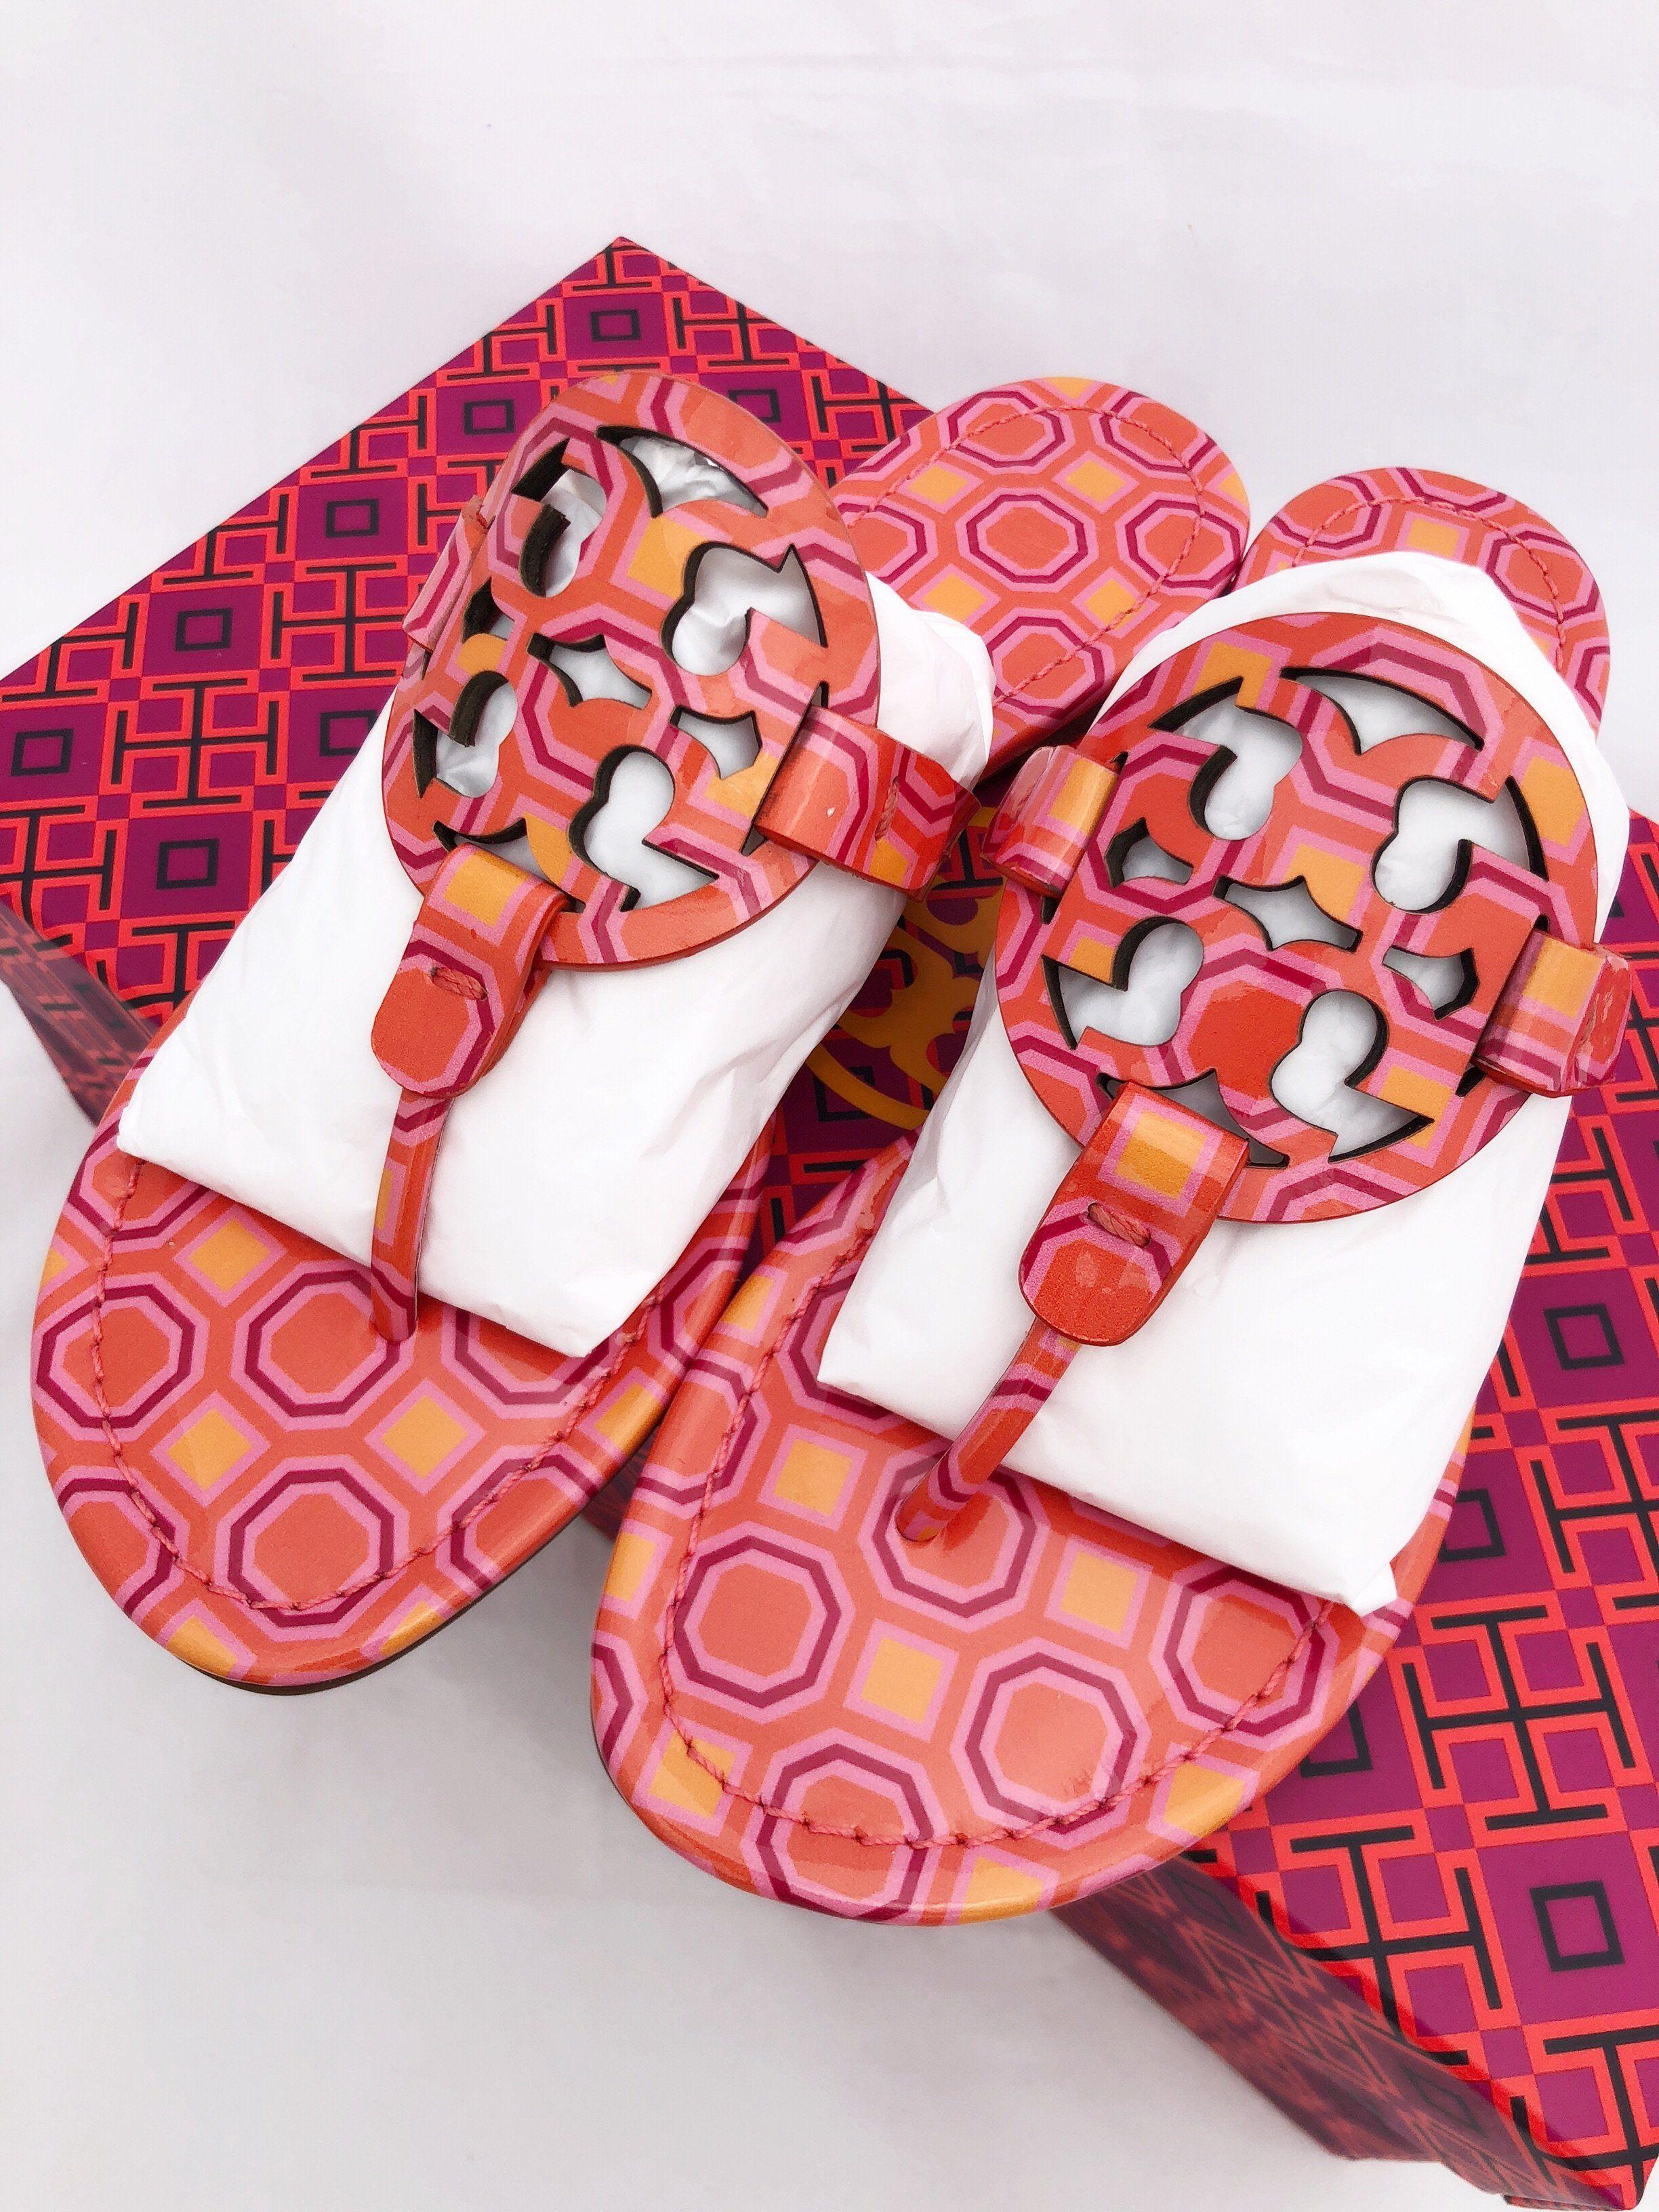 95ea98c5bfc9d Tory Burch Miller Sandals Flip Flop Vivid Orange Sqaure Coral Pink 7 7.5 8  8.5 10  GabysBags  amazonfashion  poshfashion  ebayfashion  mercariapp ...